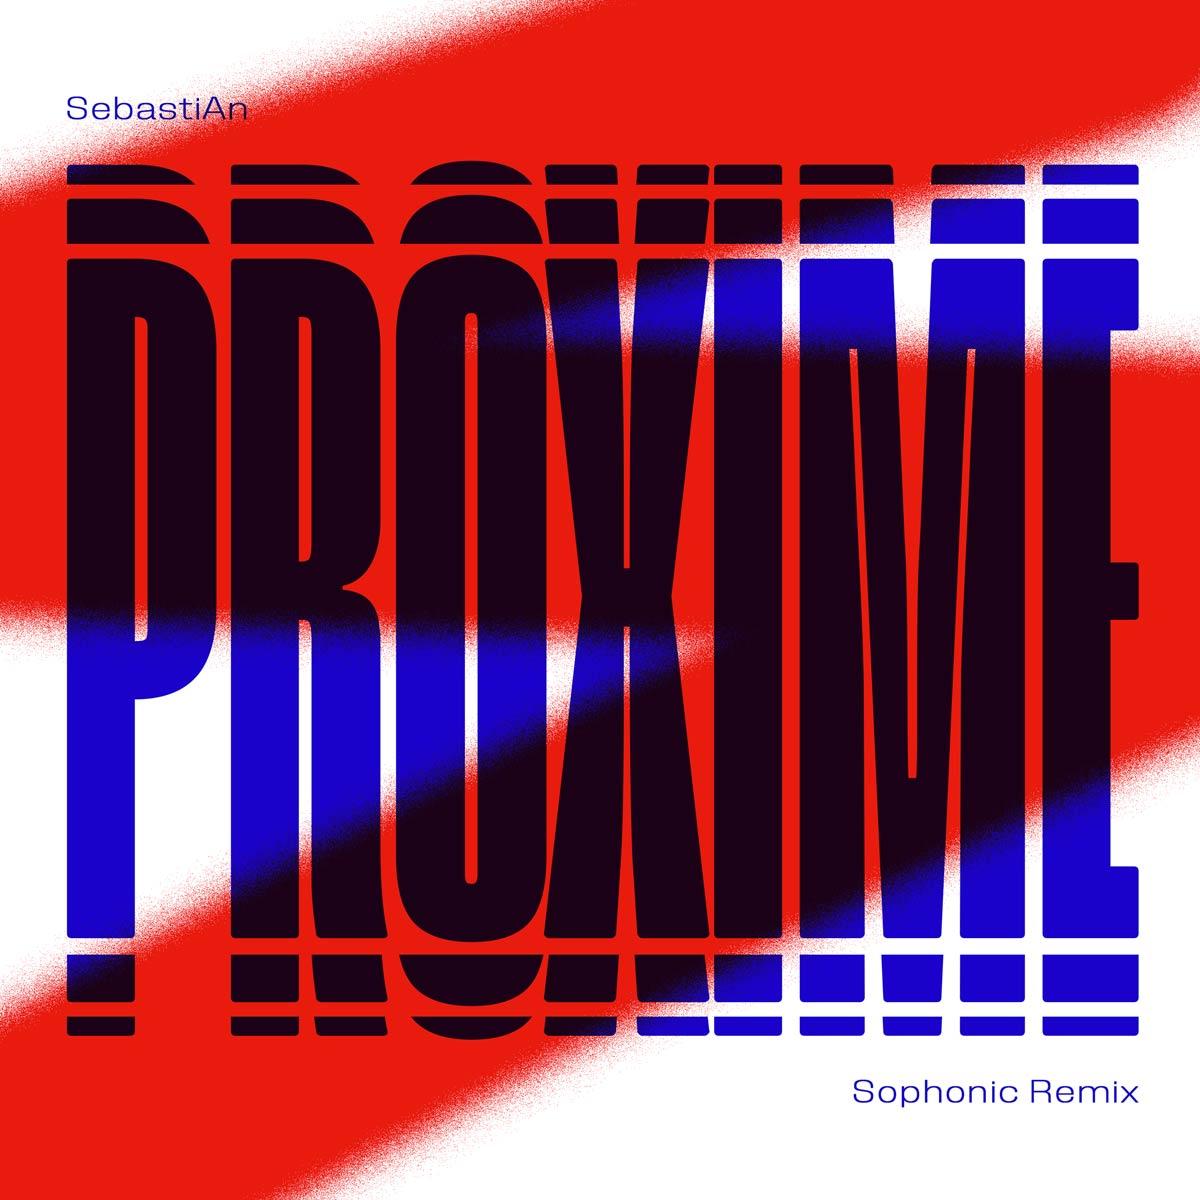 Proxime Sebastian - Sophonic Remix - artwork by Wasabi Artwork